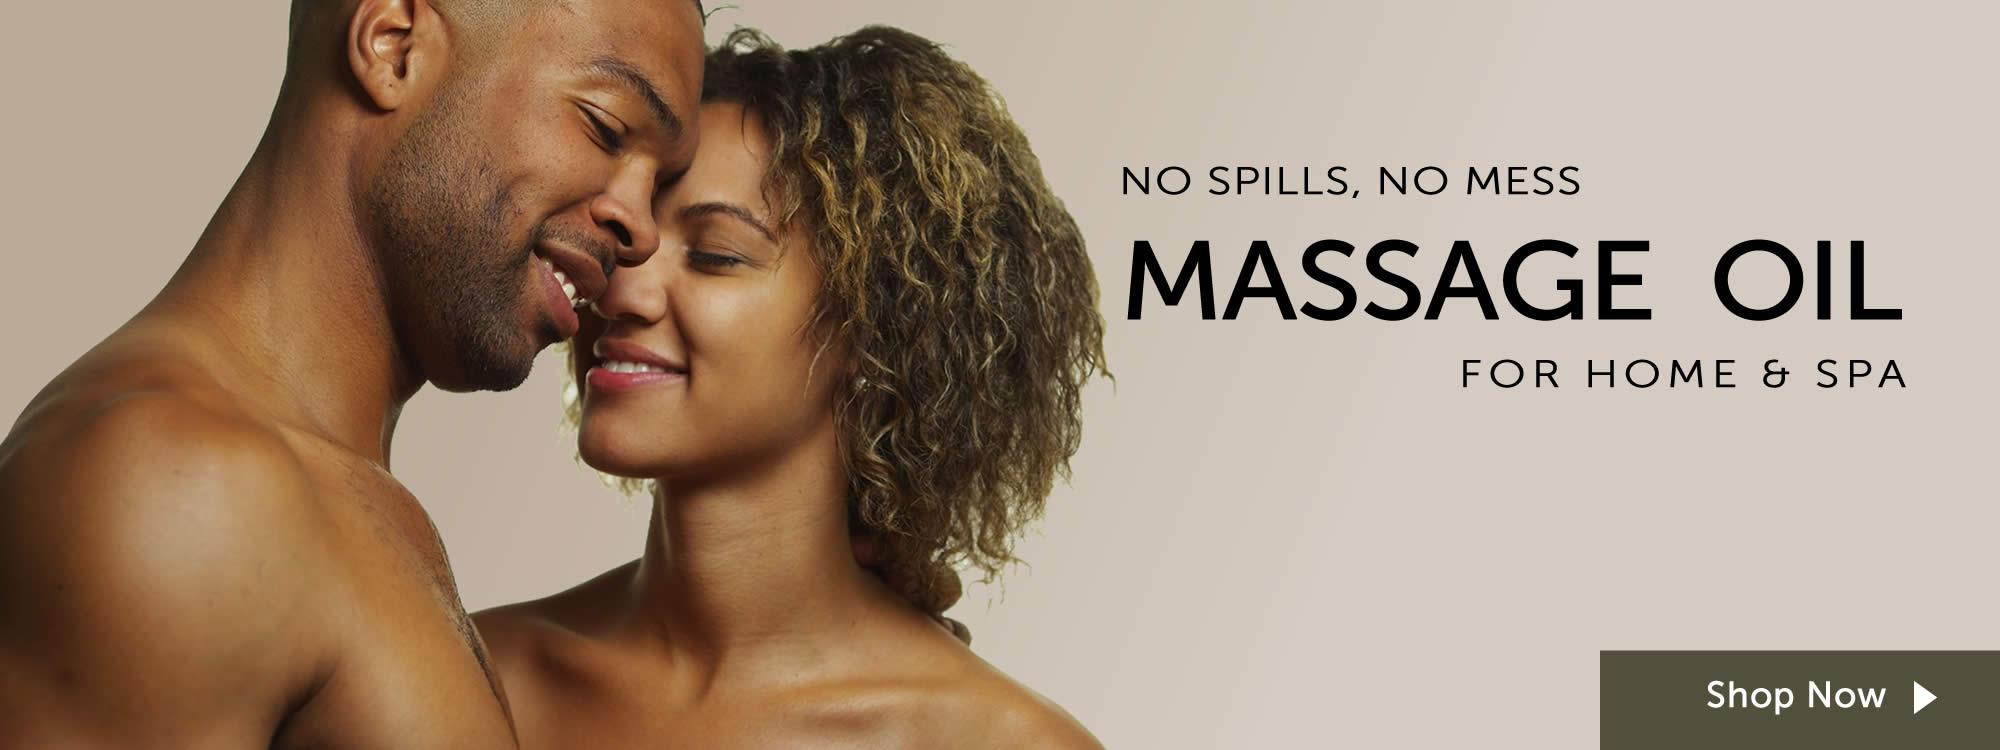 Mumanu Organic Massage Oils And Body Balms With Fairtrade Ingredients & Aromatherapy Massage Blends